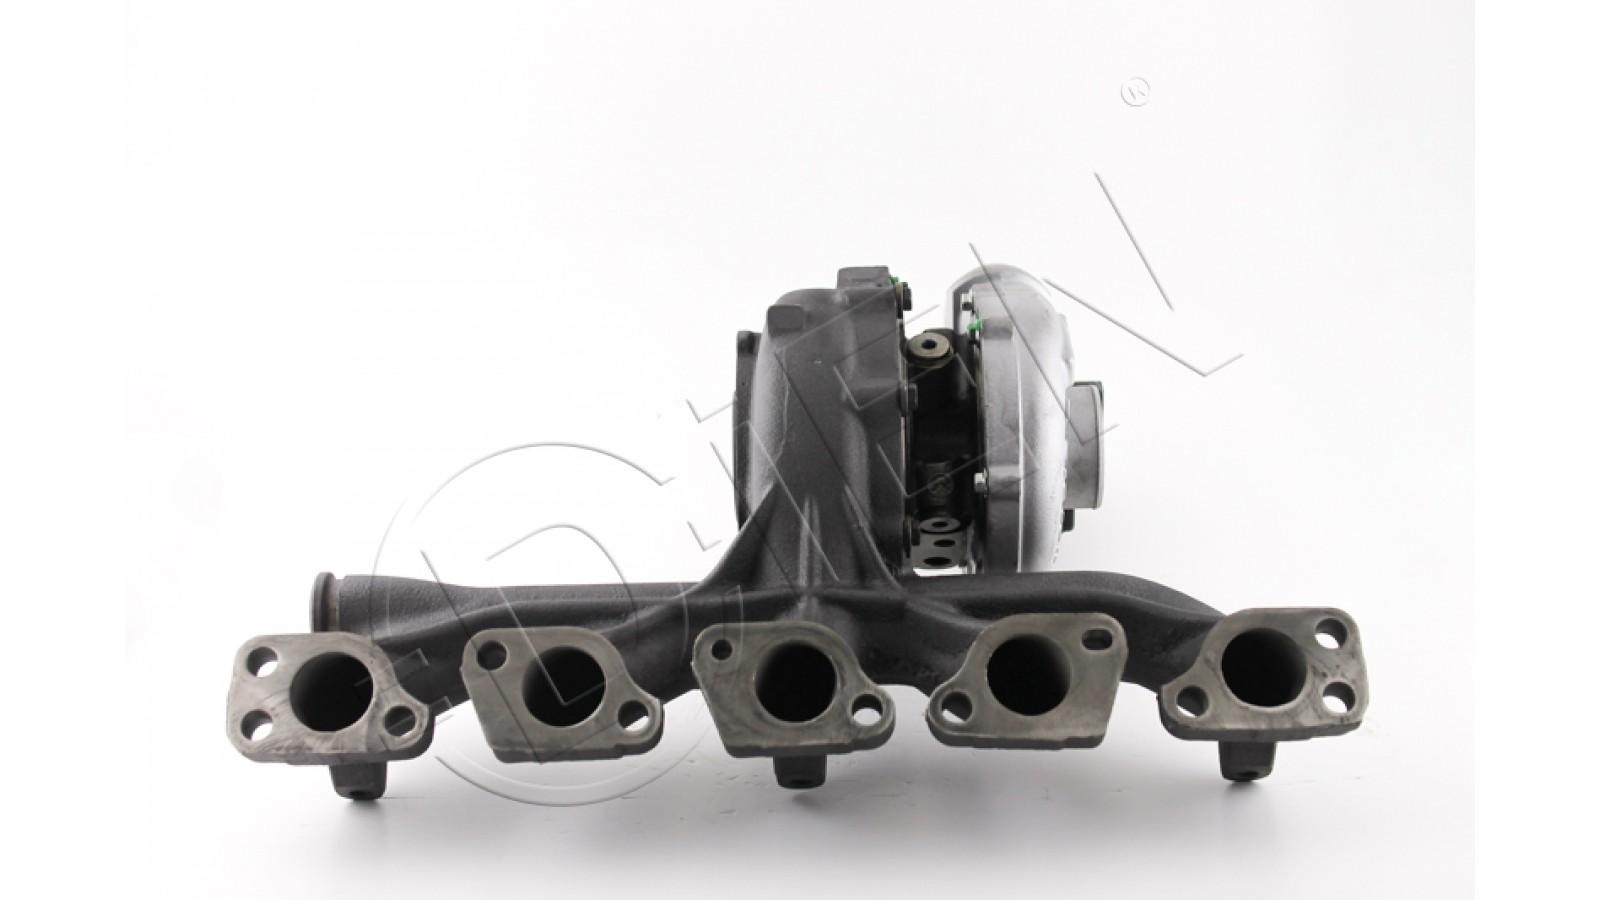 Turbocompressore  VOLVO  S40 II  2.4 D5  179Cv  2400ccm  mar 2006